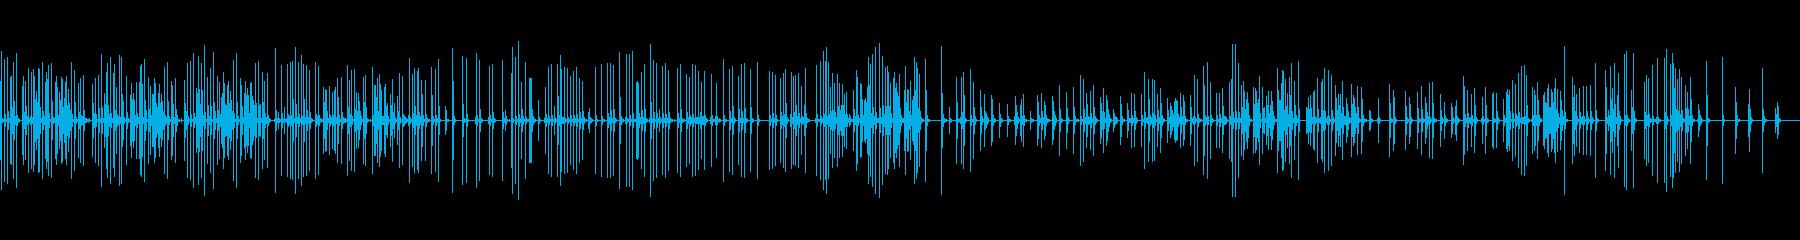 三味線137越後獅子1新潟県月潟角兵衛獅の再生済みの波形